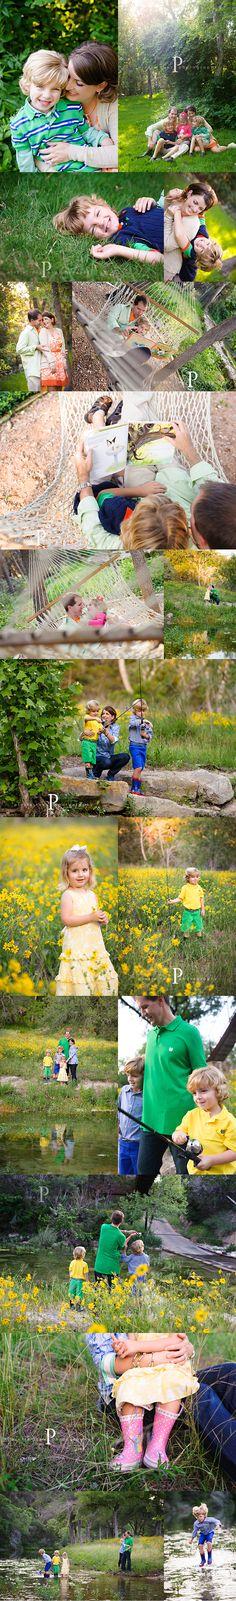 tw-beautiful-austin-family-lifestyle-photography.jpg